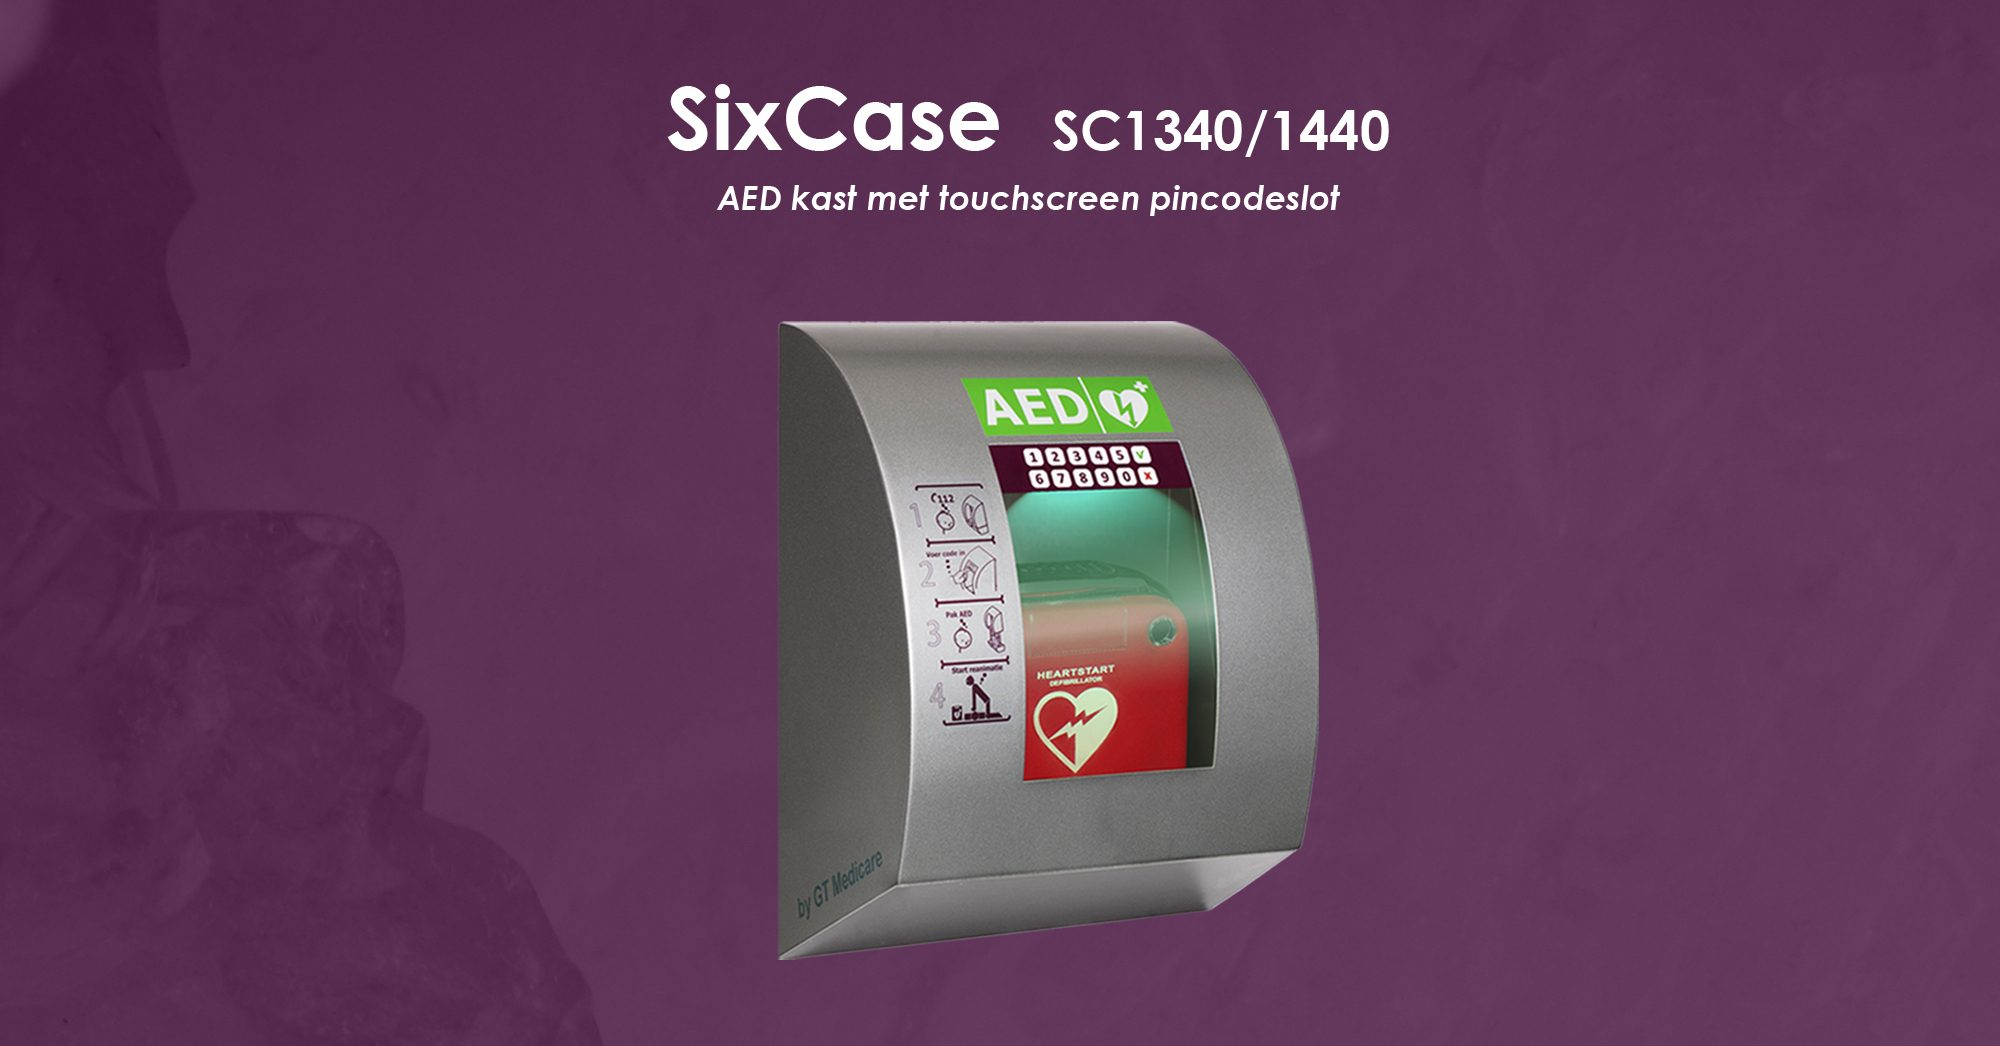 Sc13401440 Aed Kast Met Touchscreen Pincodeslot